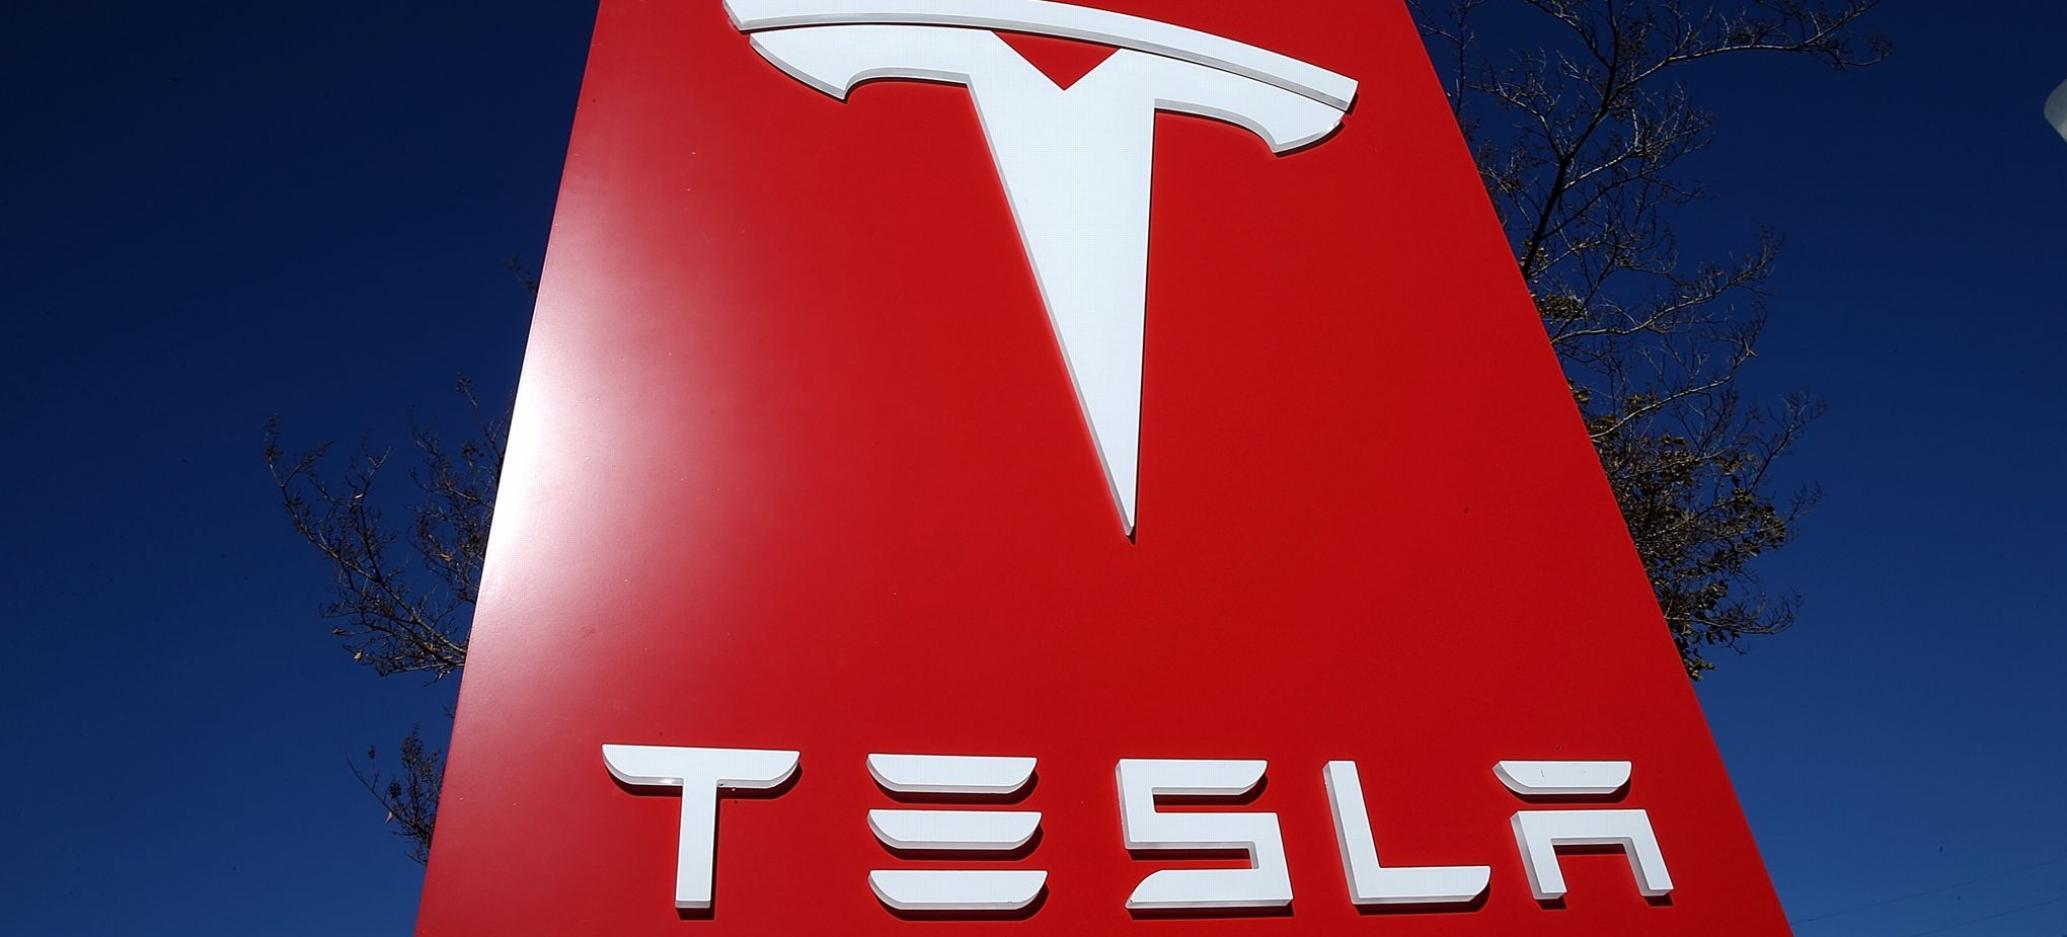 Tesla Taking Risks